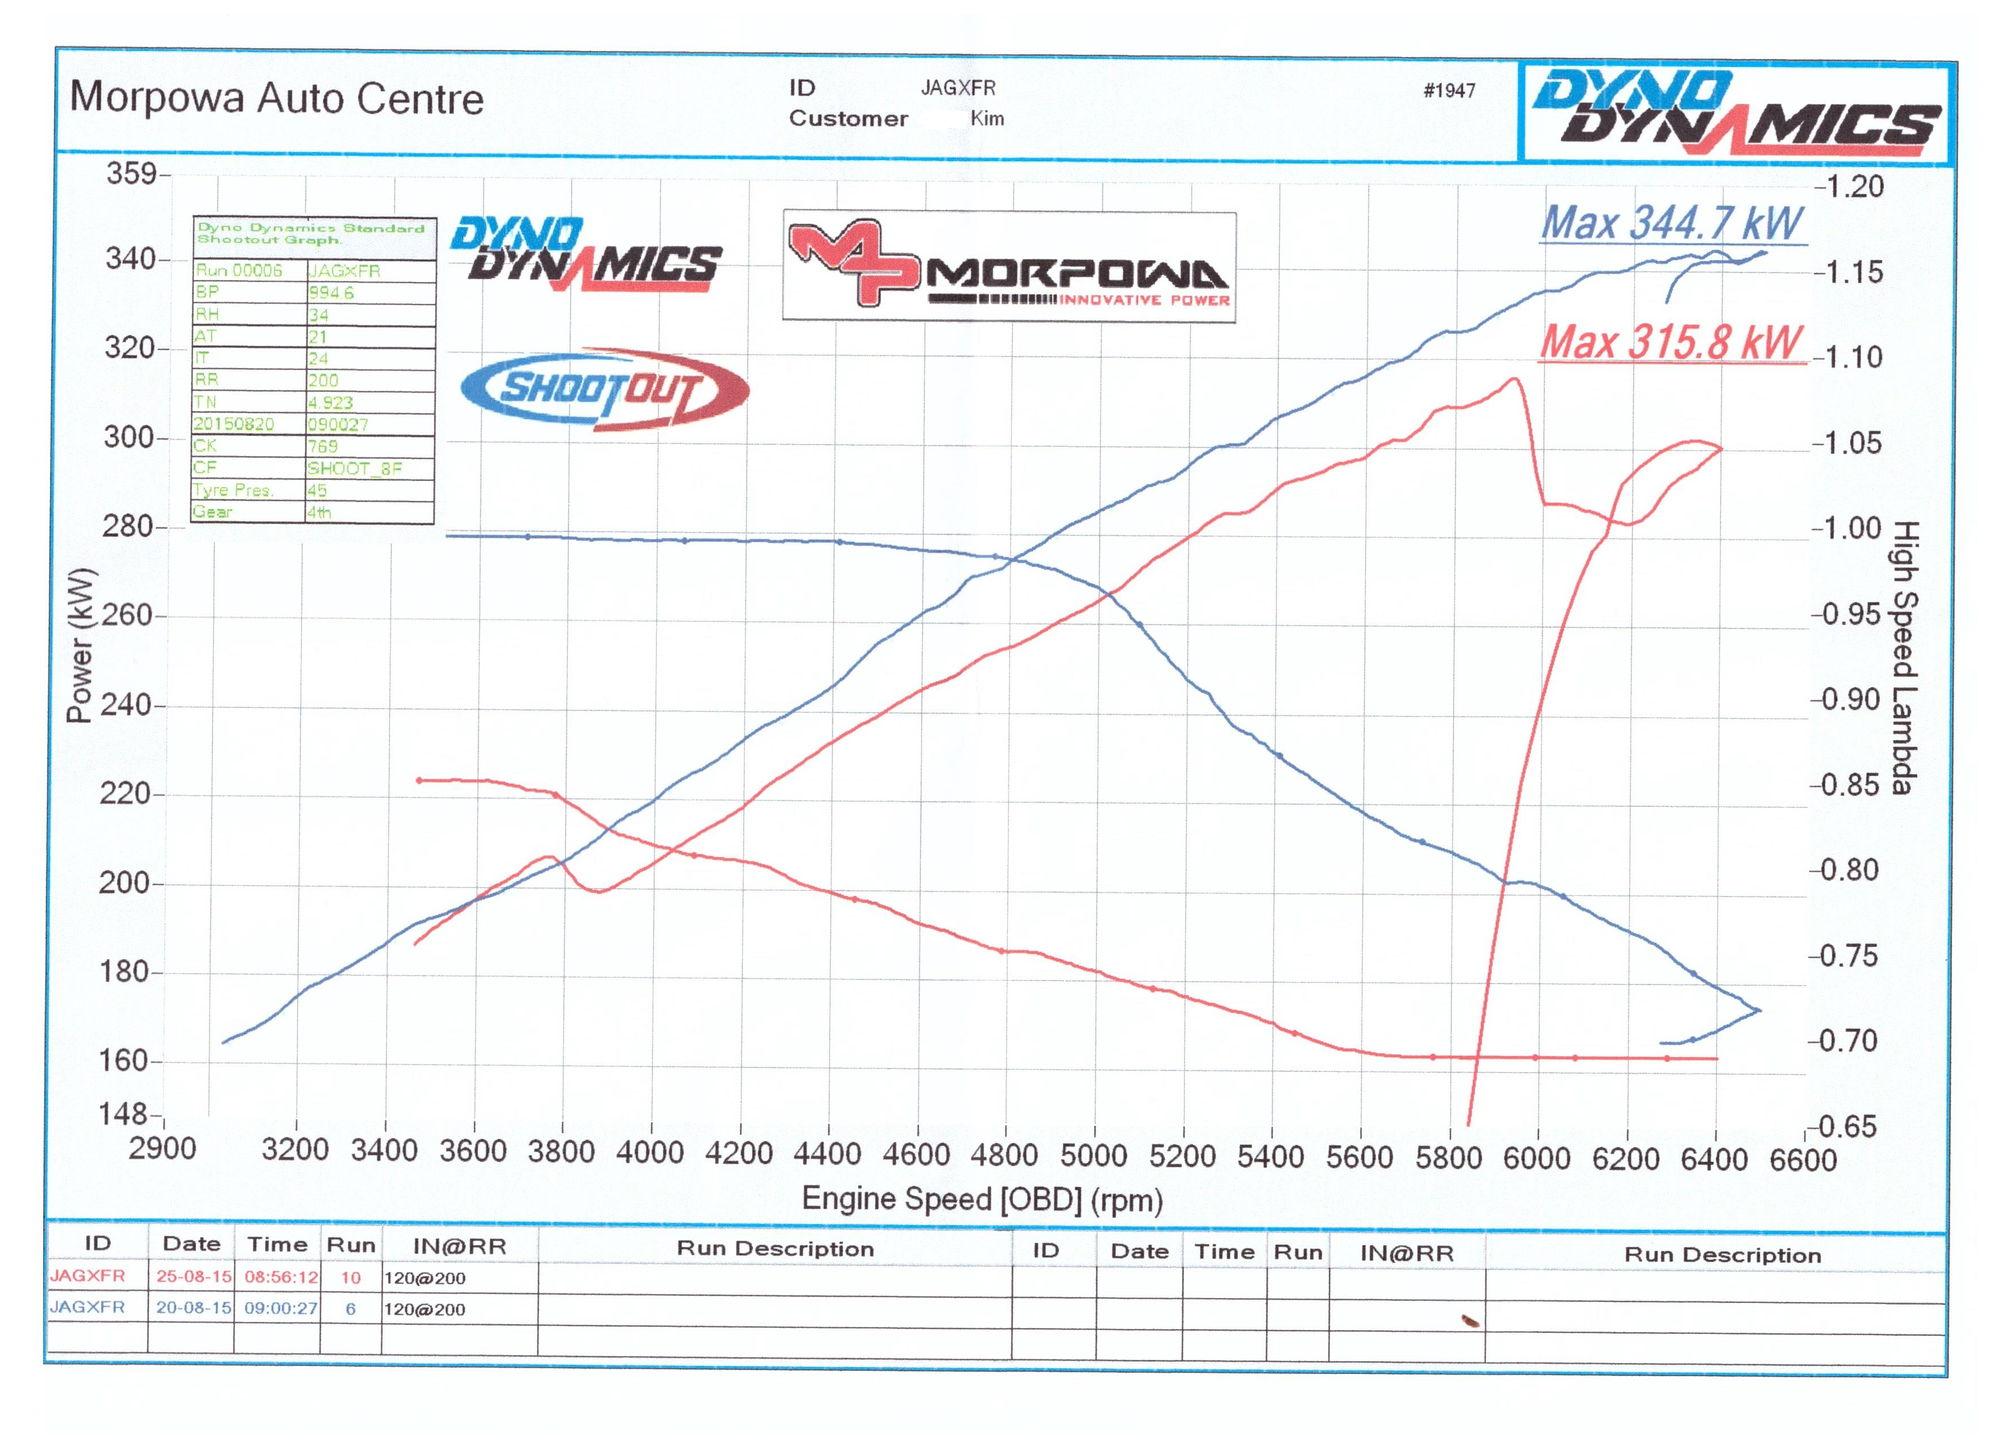 80 xfr_dyno_post_tune_1_bca91510017d00fbb963d2c6b97e282f32bef5ee fl70 mins wiring diagram impulse brake controller wiring diagram 95 freightliner fl70 fuse box diagram at creativeand.co